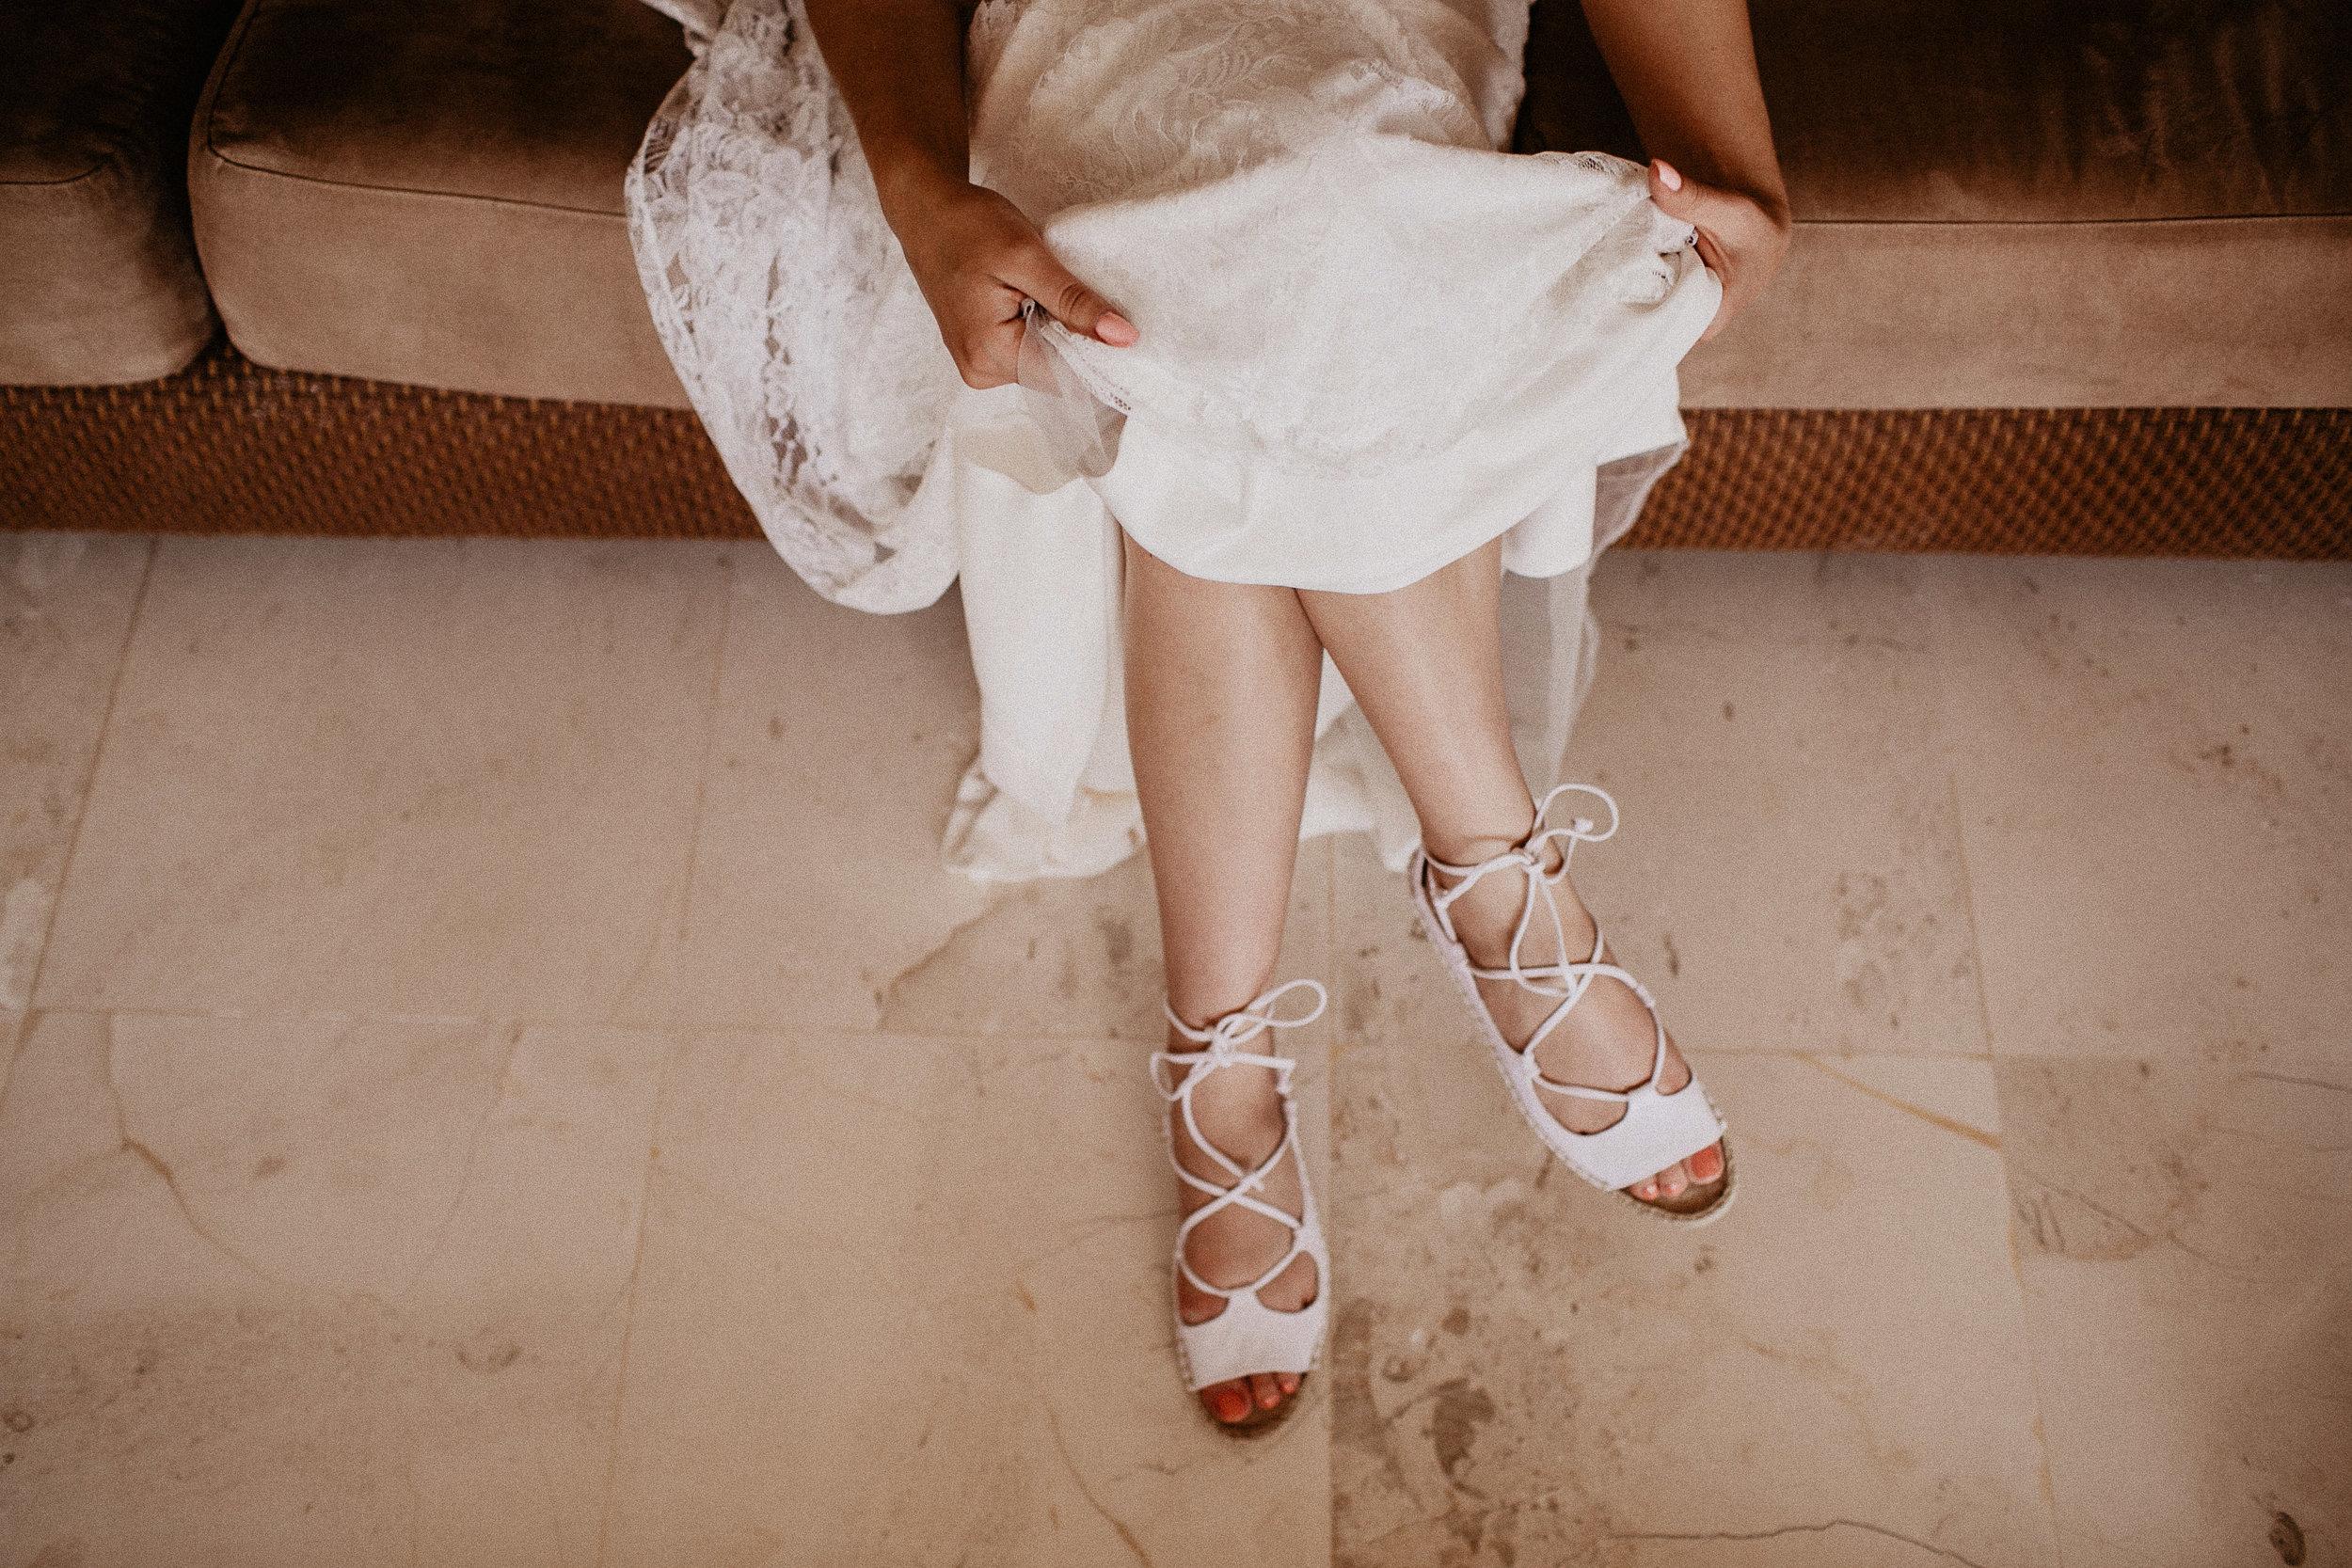 alfonso_flores_destination_wedding_photography_puerto_vallarta_hotel_barcelo_vallarta_cuttler_amela-177.JPG